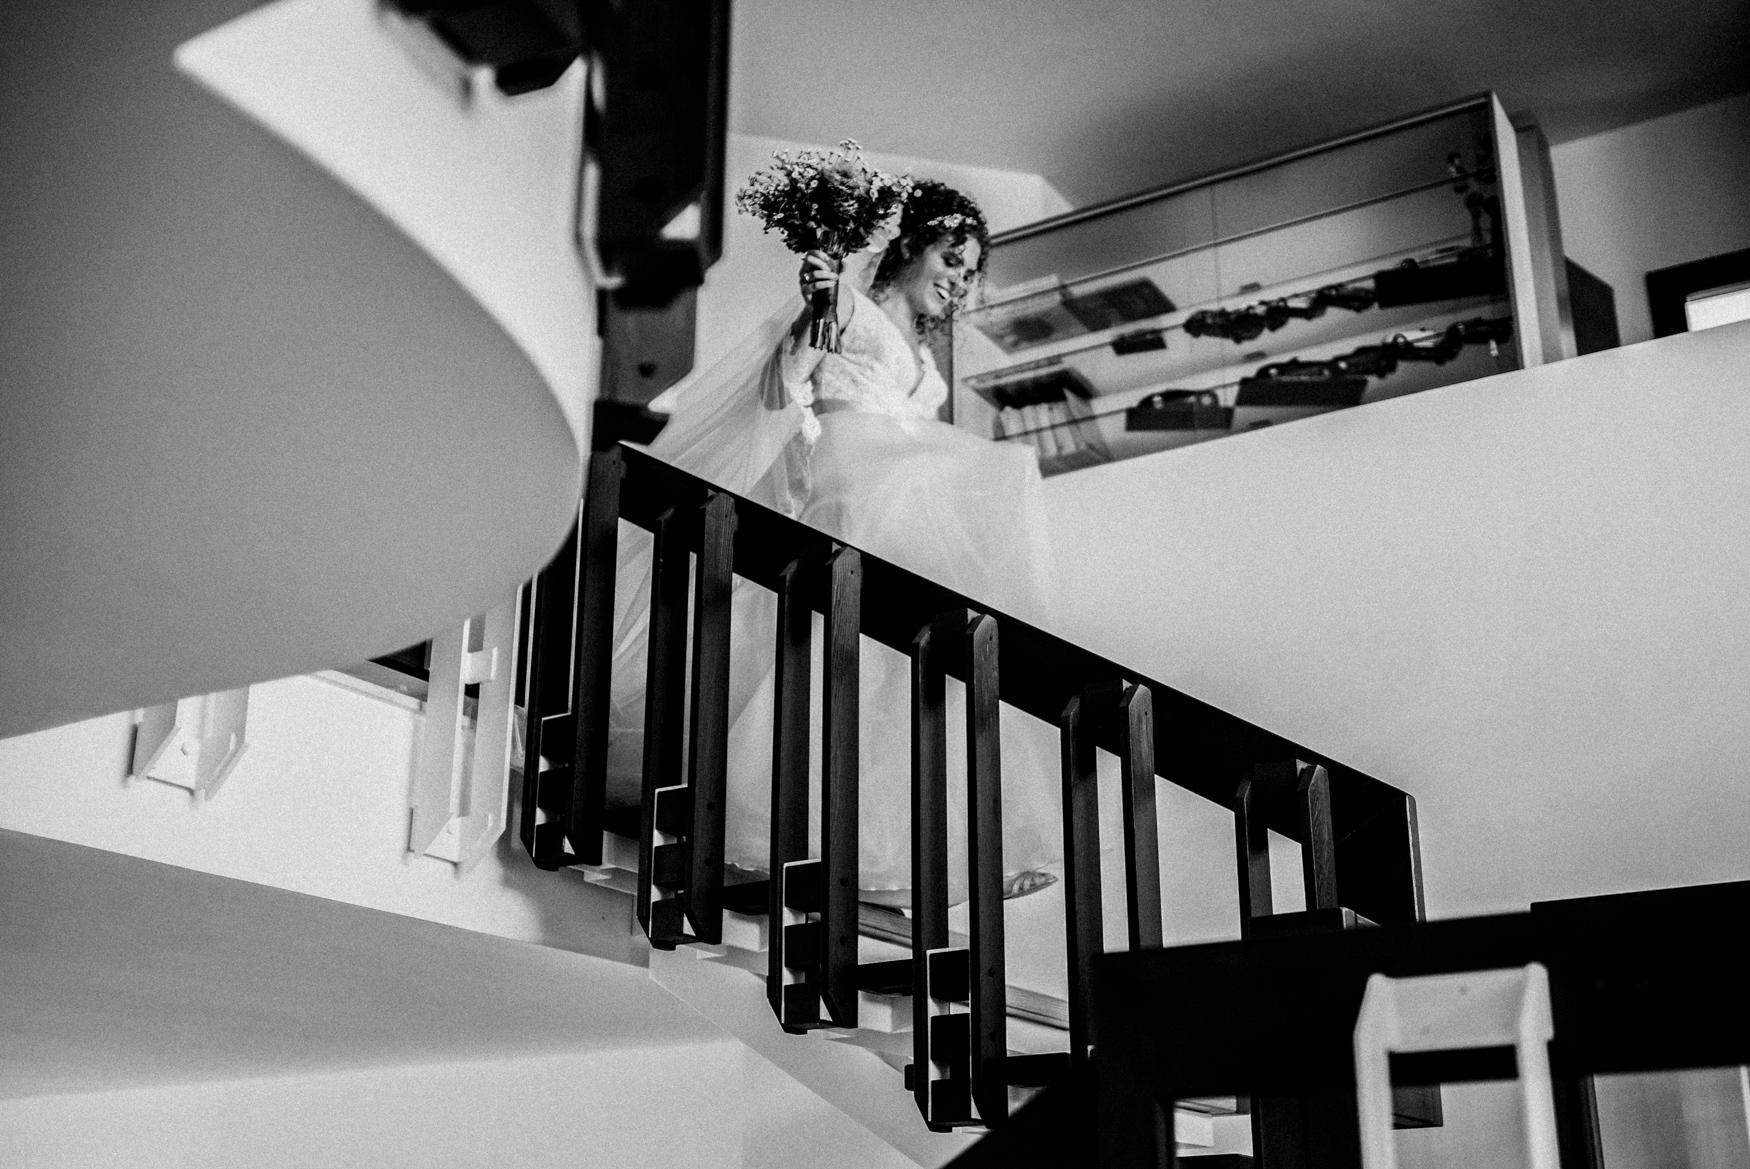 LR2 beirut byblos wedding photographer lebanon 019.jpg